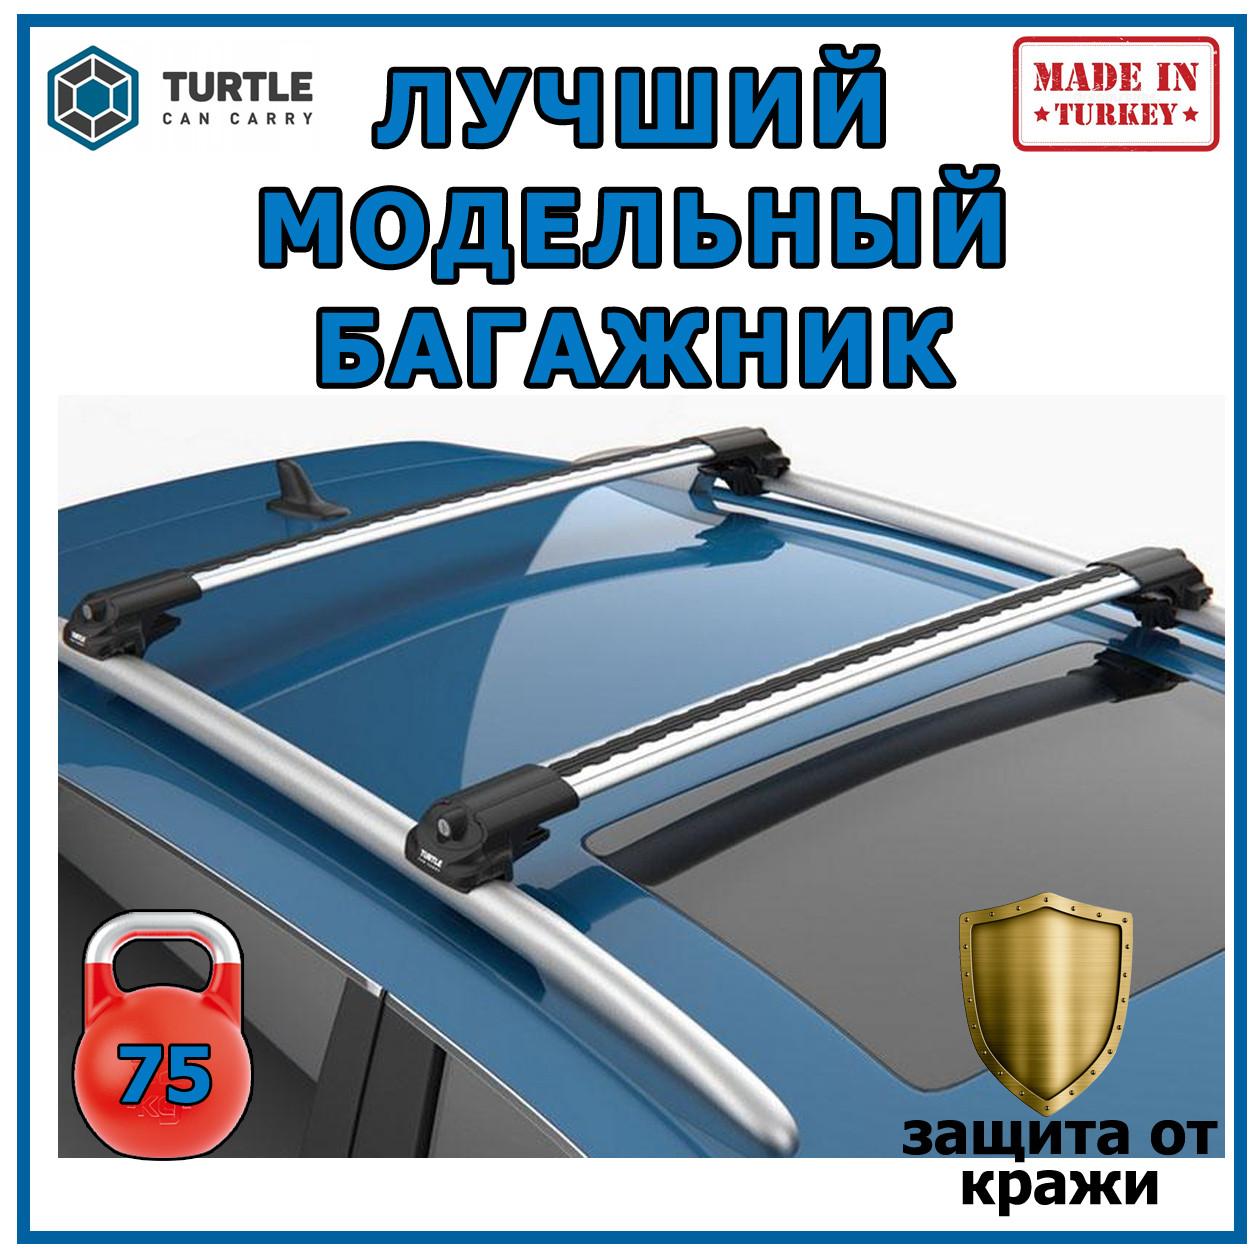 Багажник на дах Fiat Marea 1996-2003 на рейлінги сірий Turtle